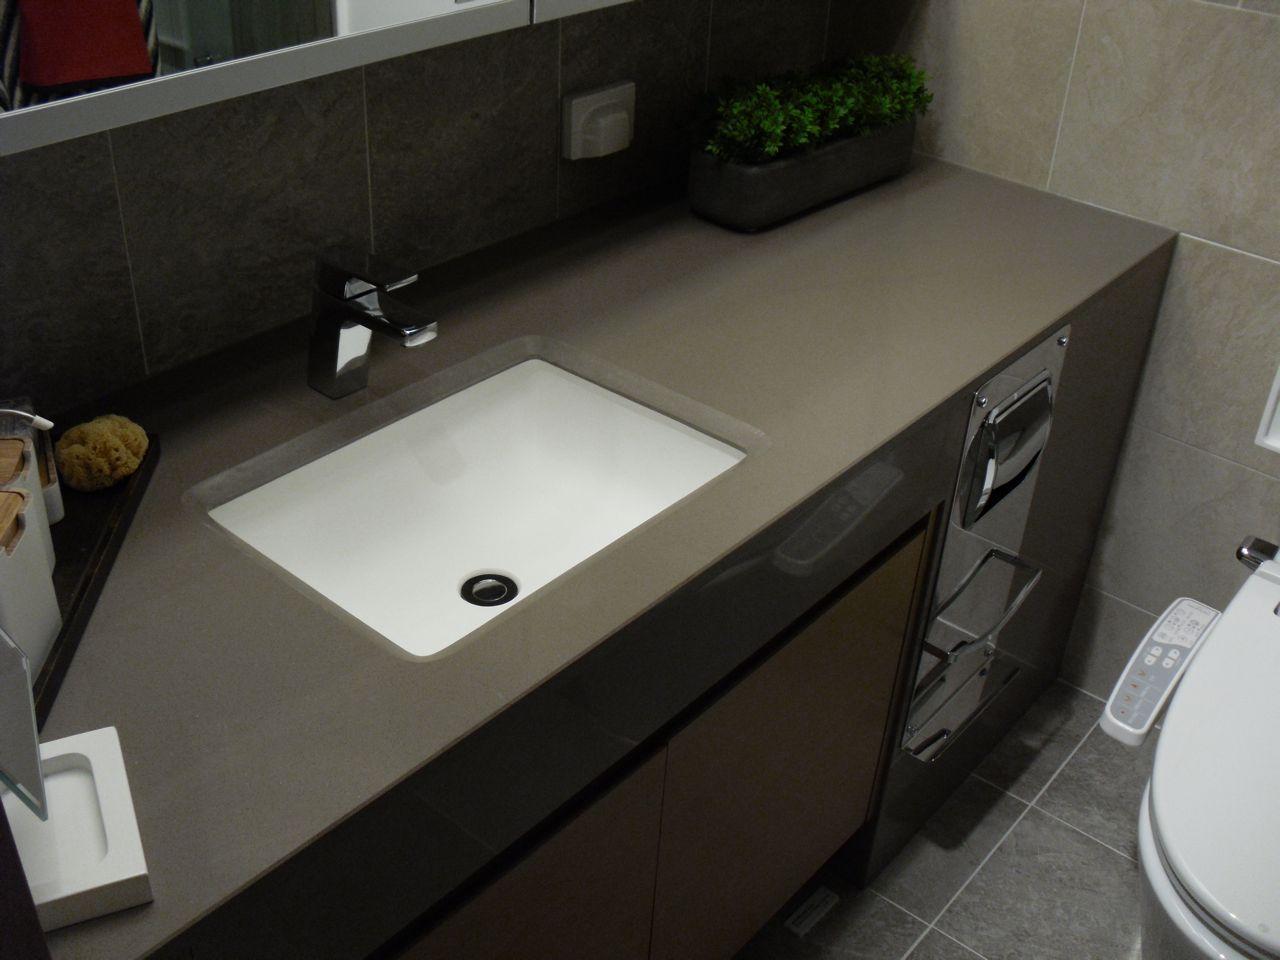 Gray Quartz Bathroom Counter   ... Kitchen Trends U2013 Clean And Monotone  Looking Kitchen